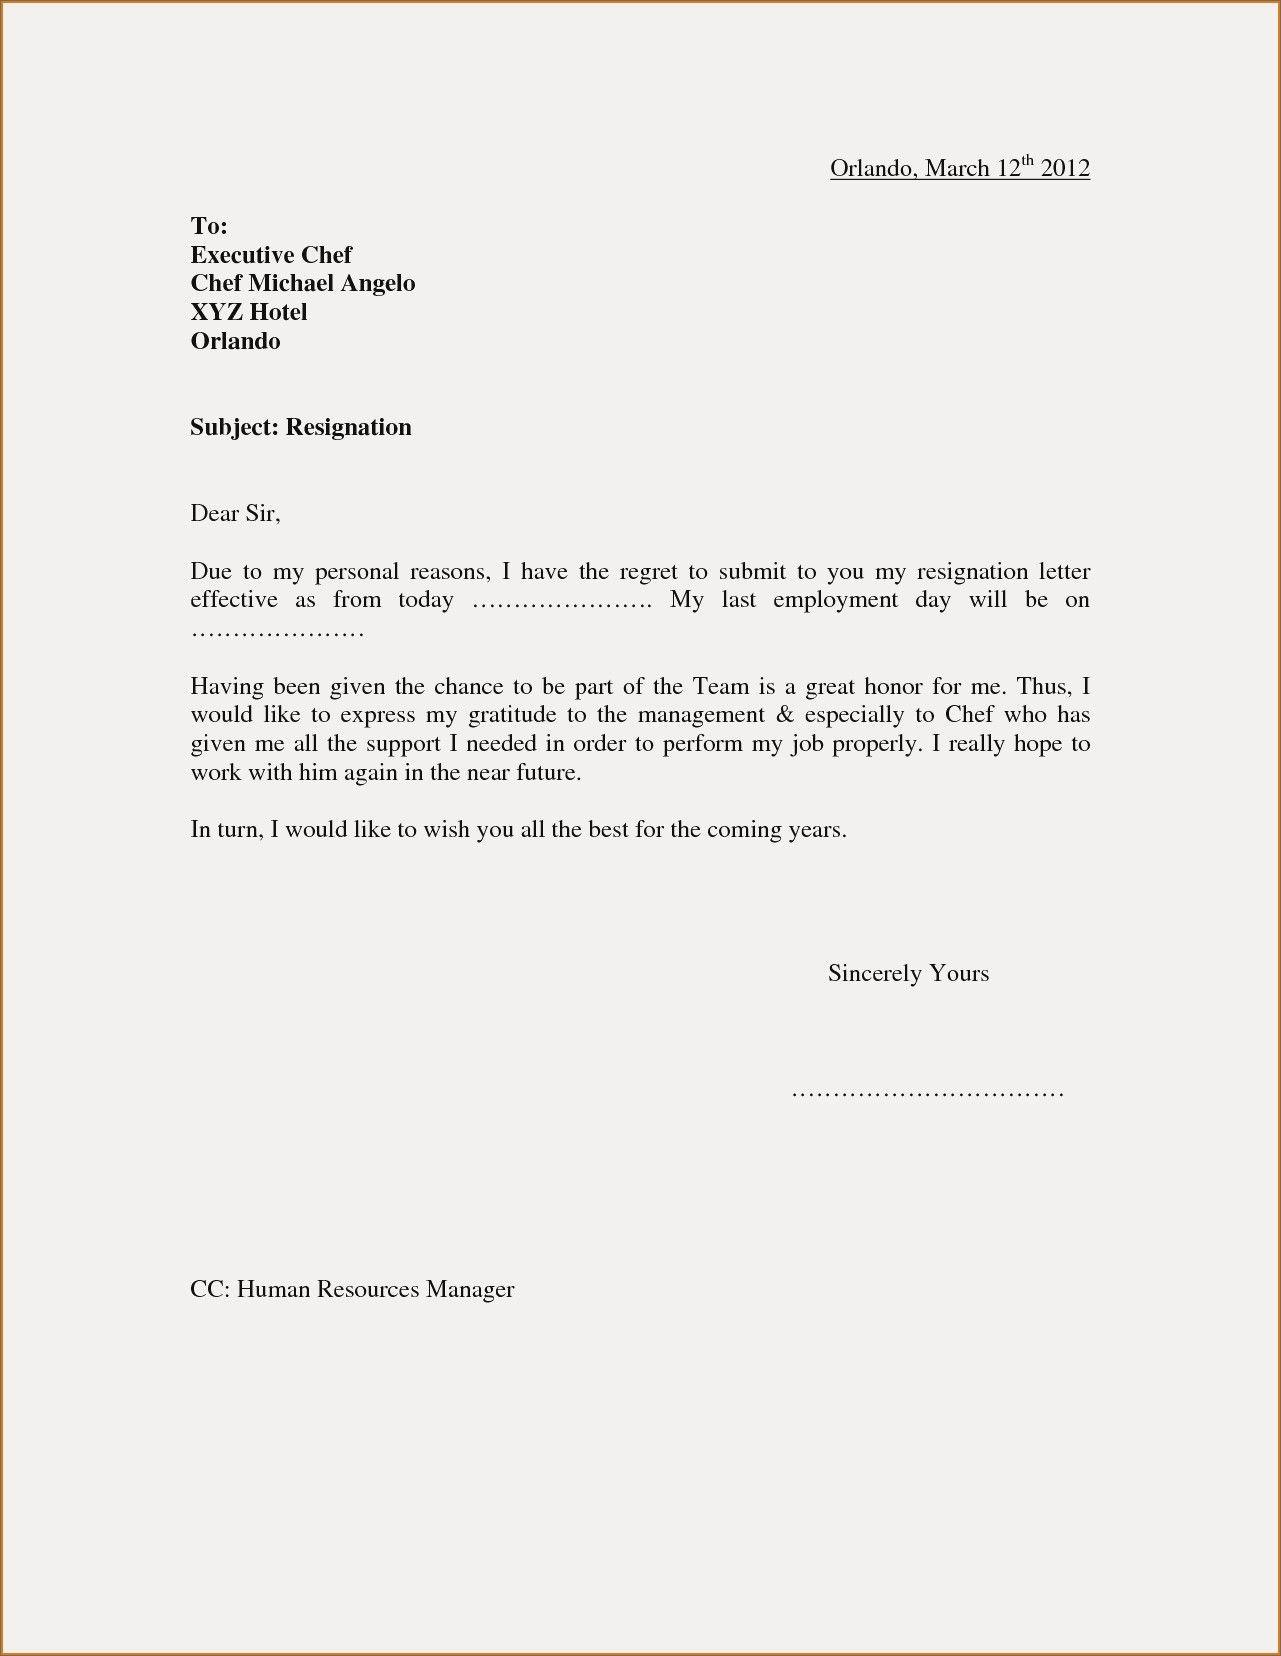 Download Best Of Resignation Letter From Job Samples Lettersample